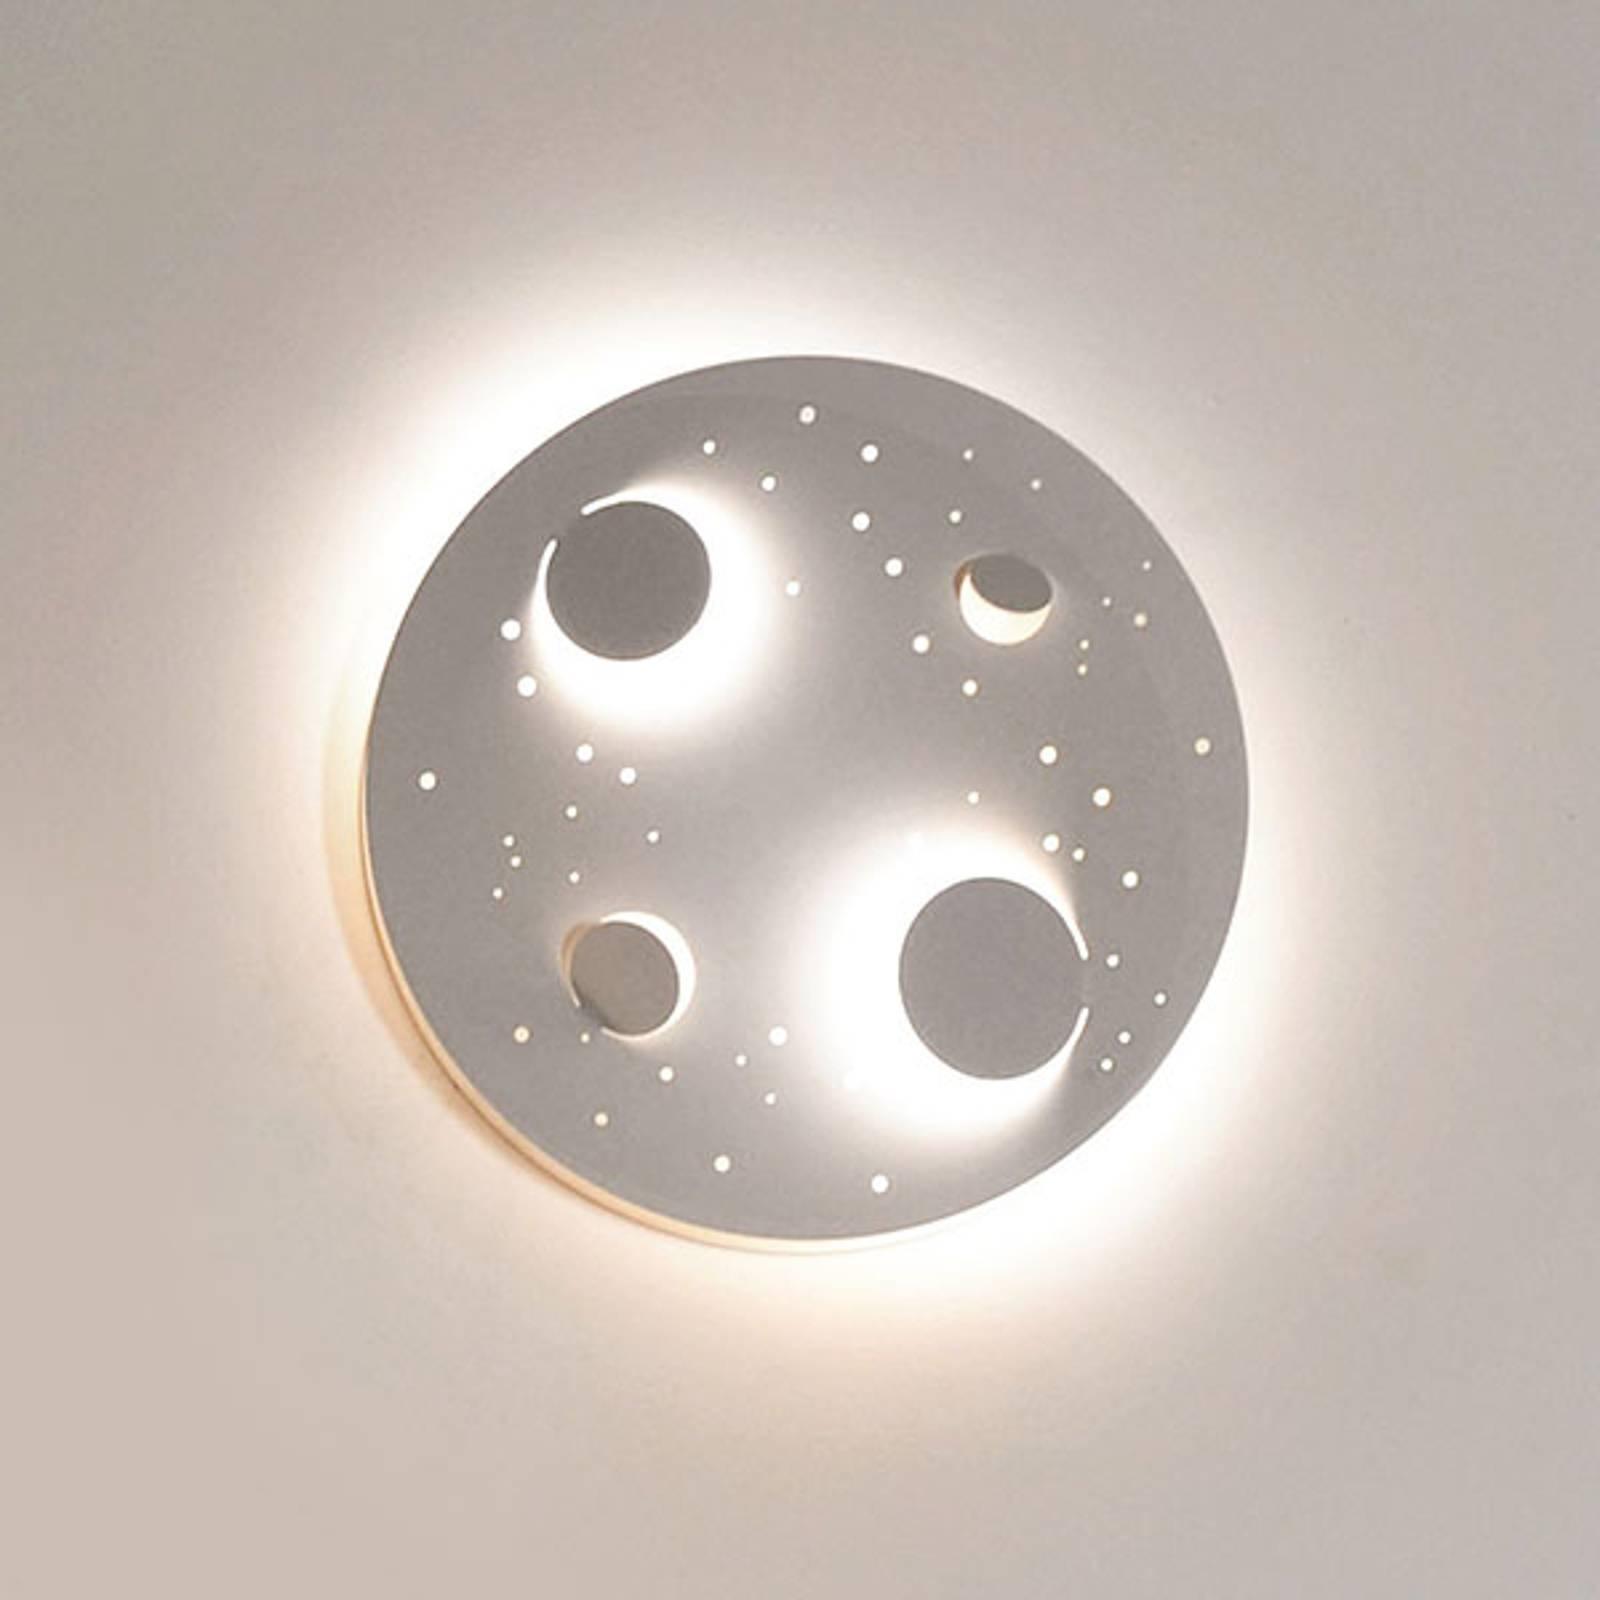 Knikerboker Buchi applique LED Ø 40cm blanche